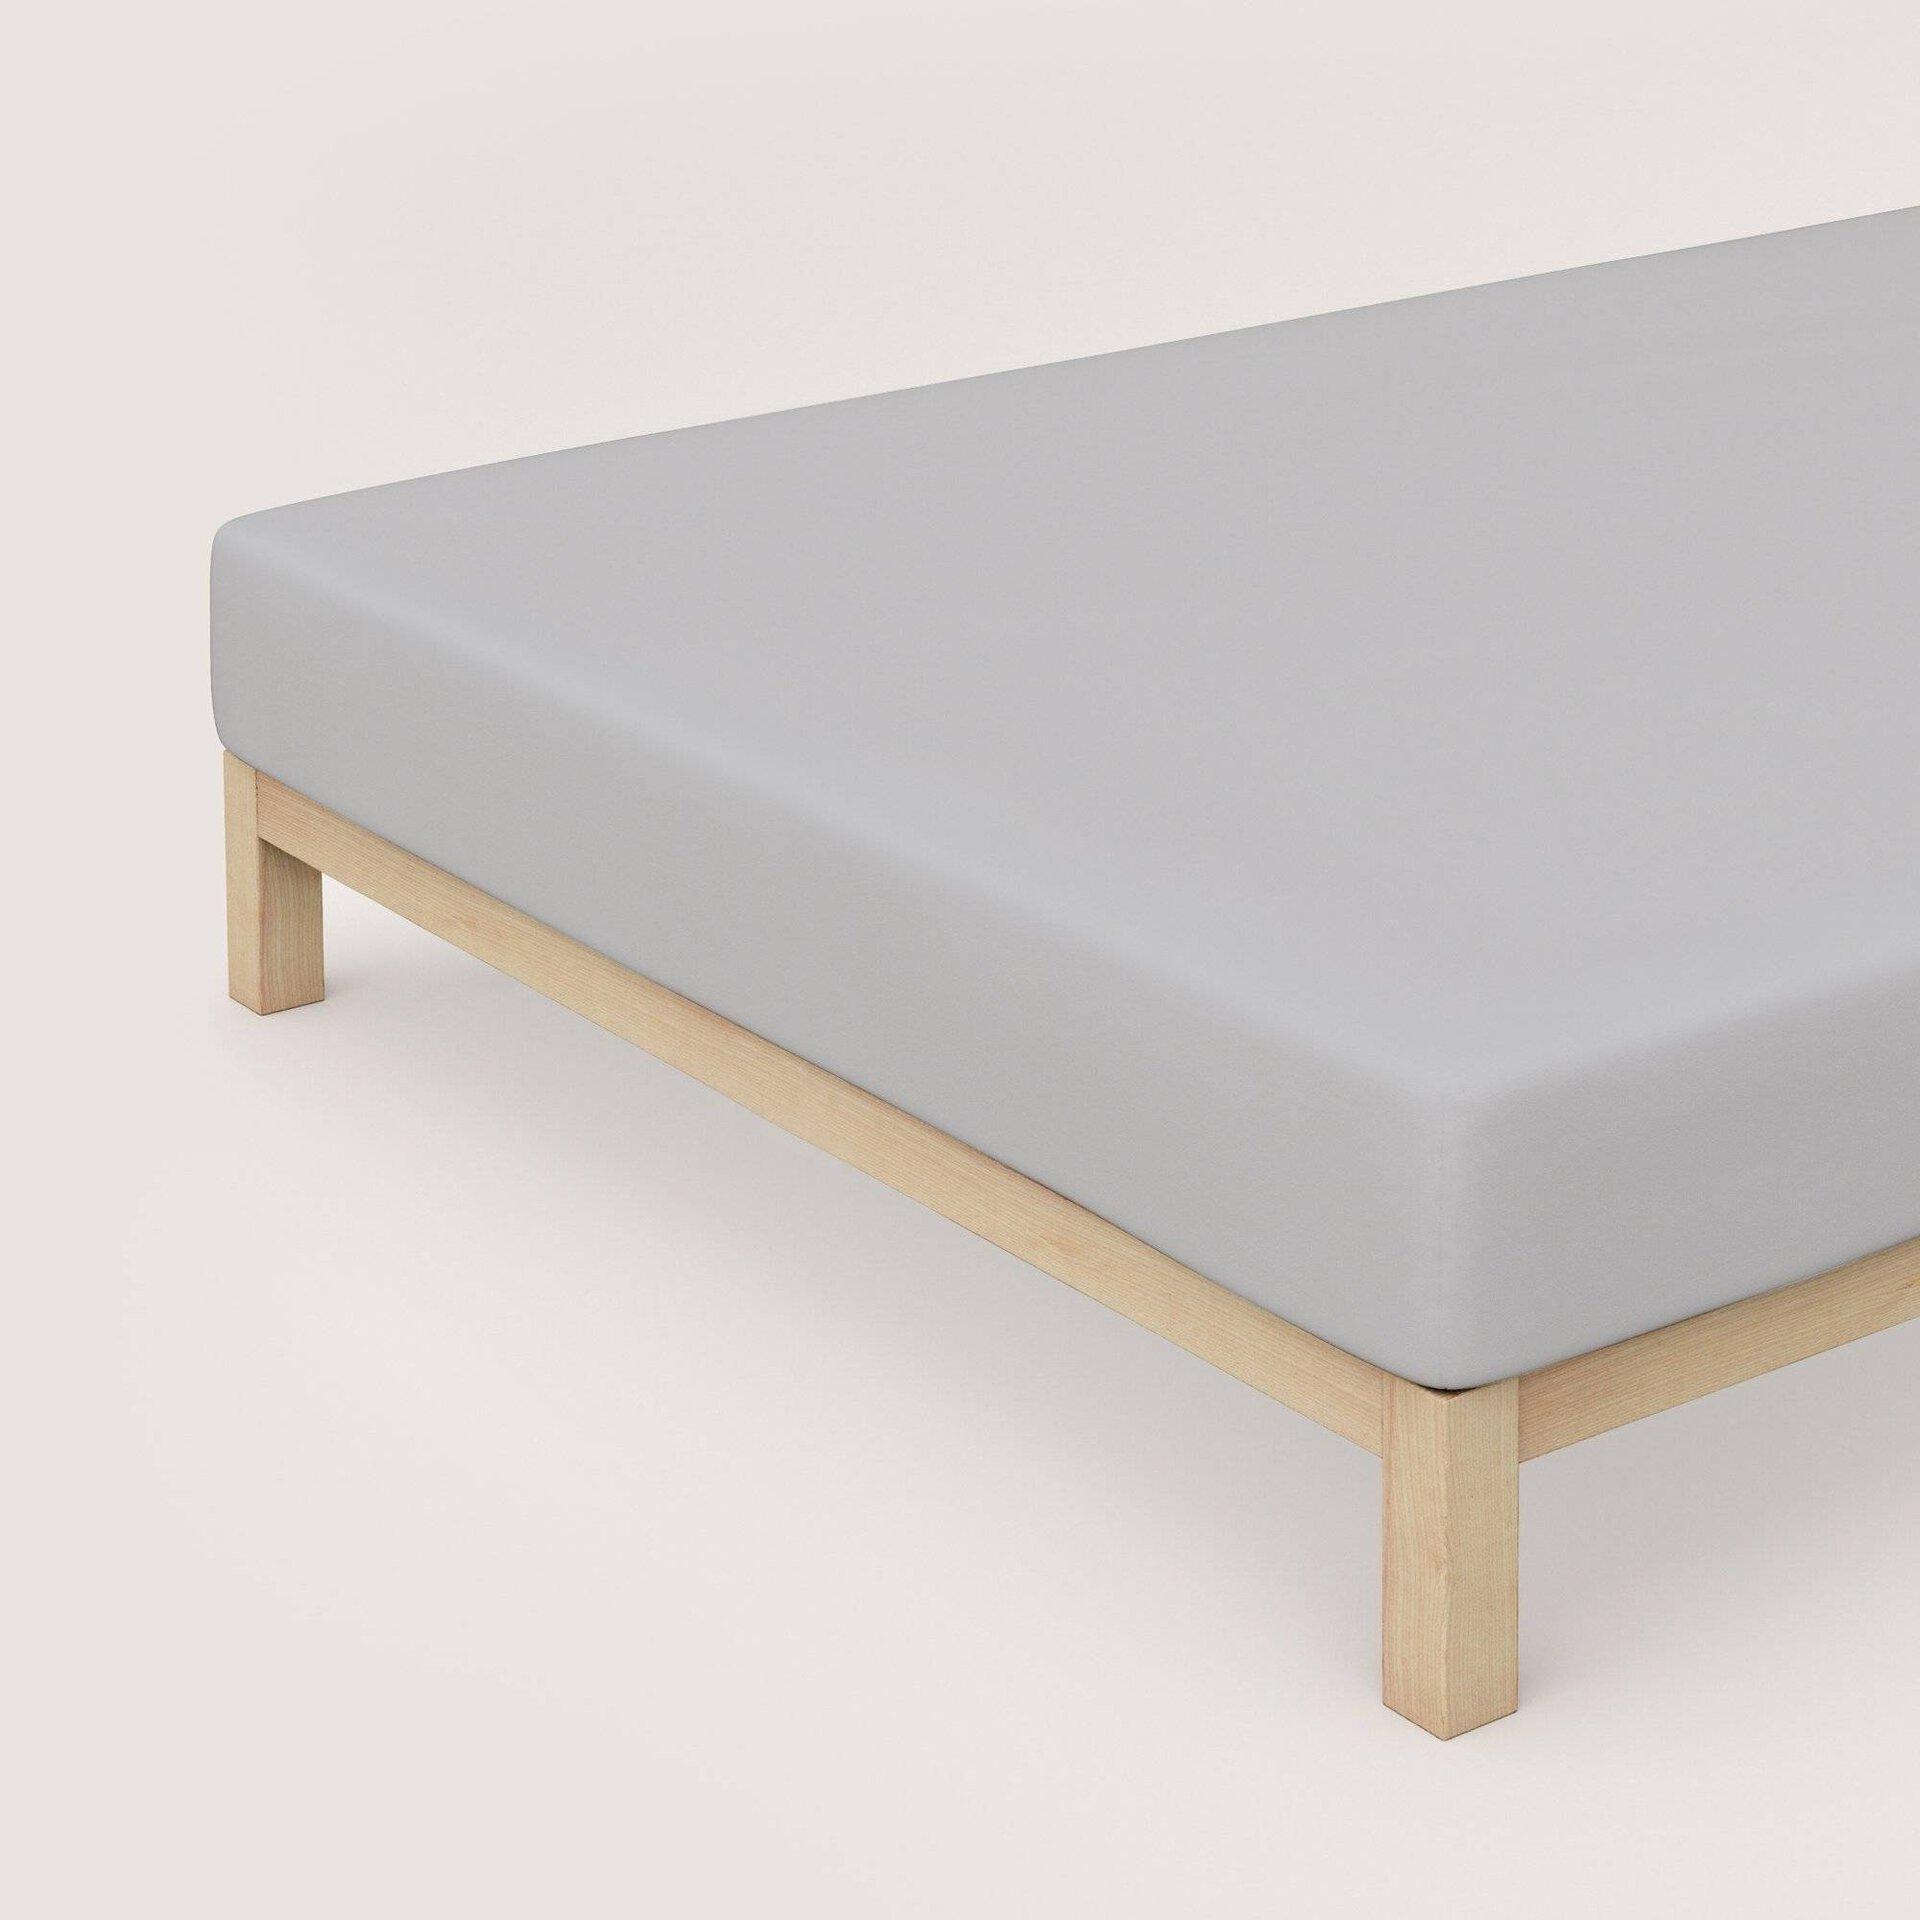 Elastan Jersey-Spannbetttuch Schlafgut Textil 180 x 200 cm